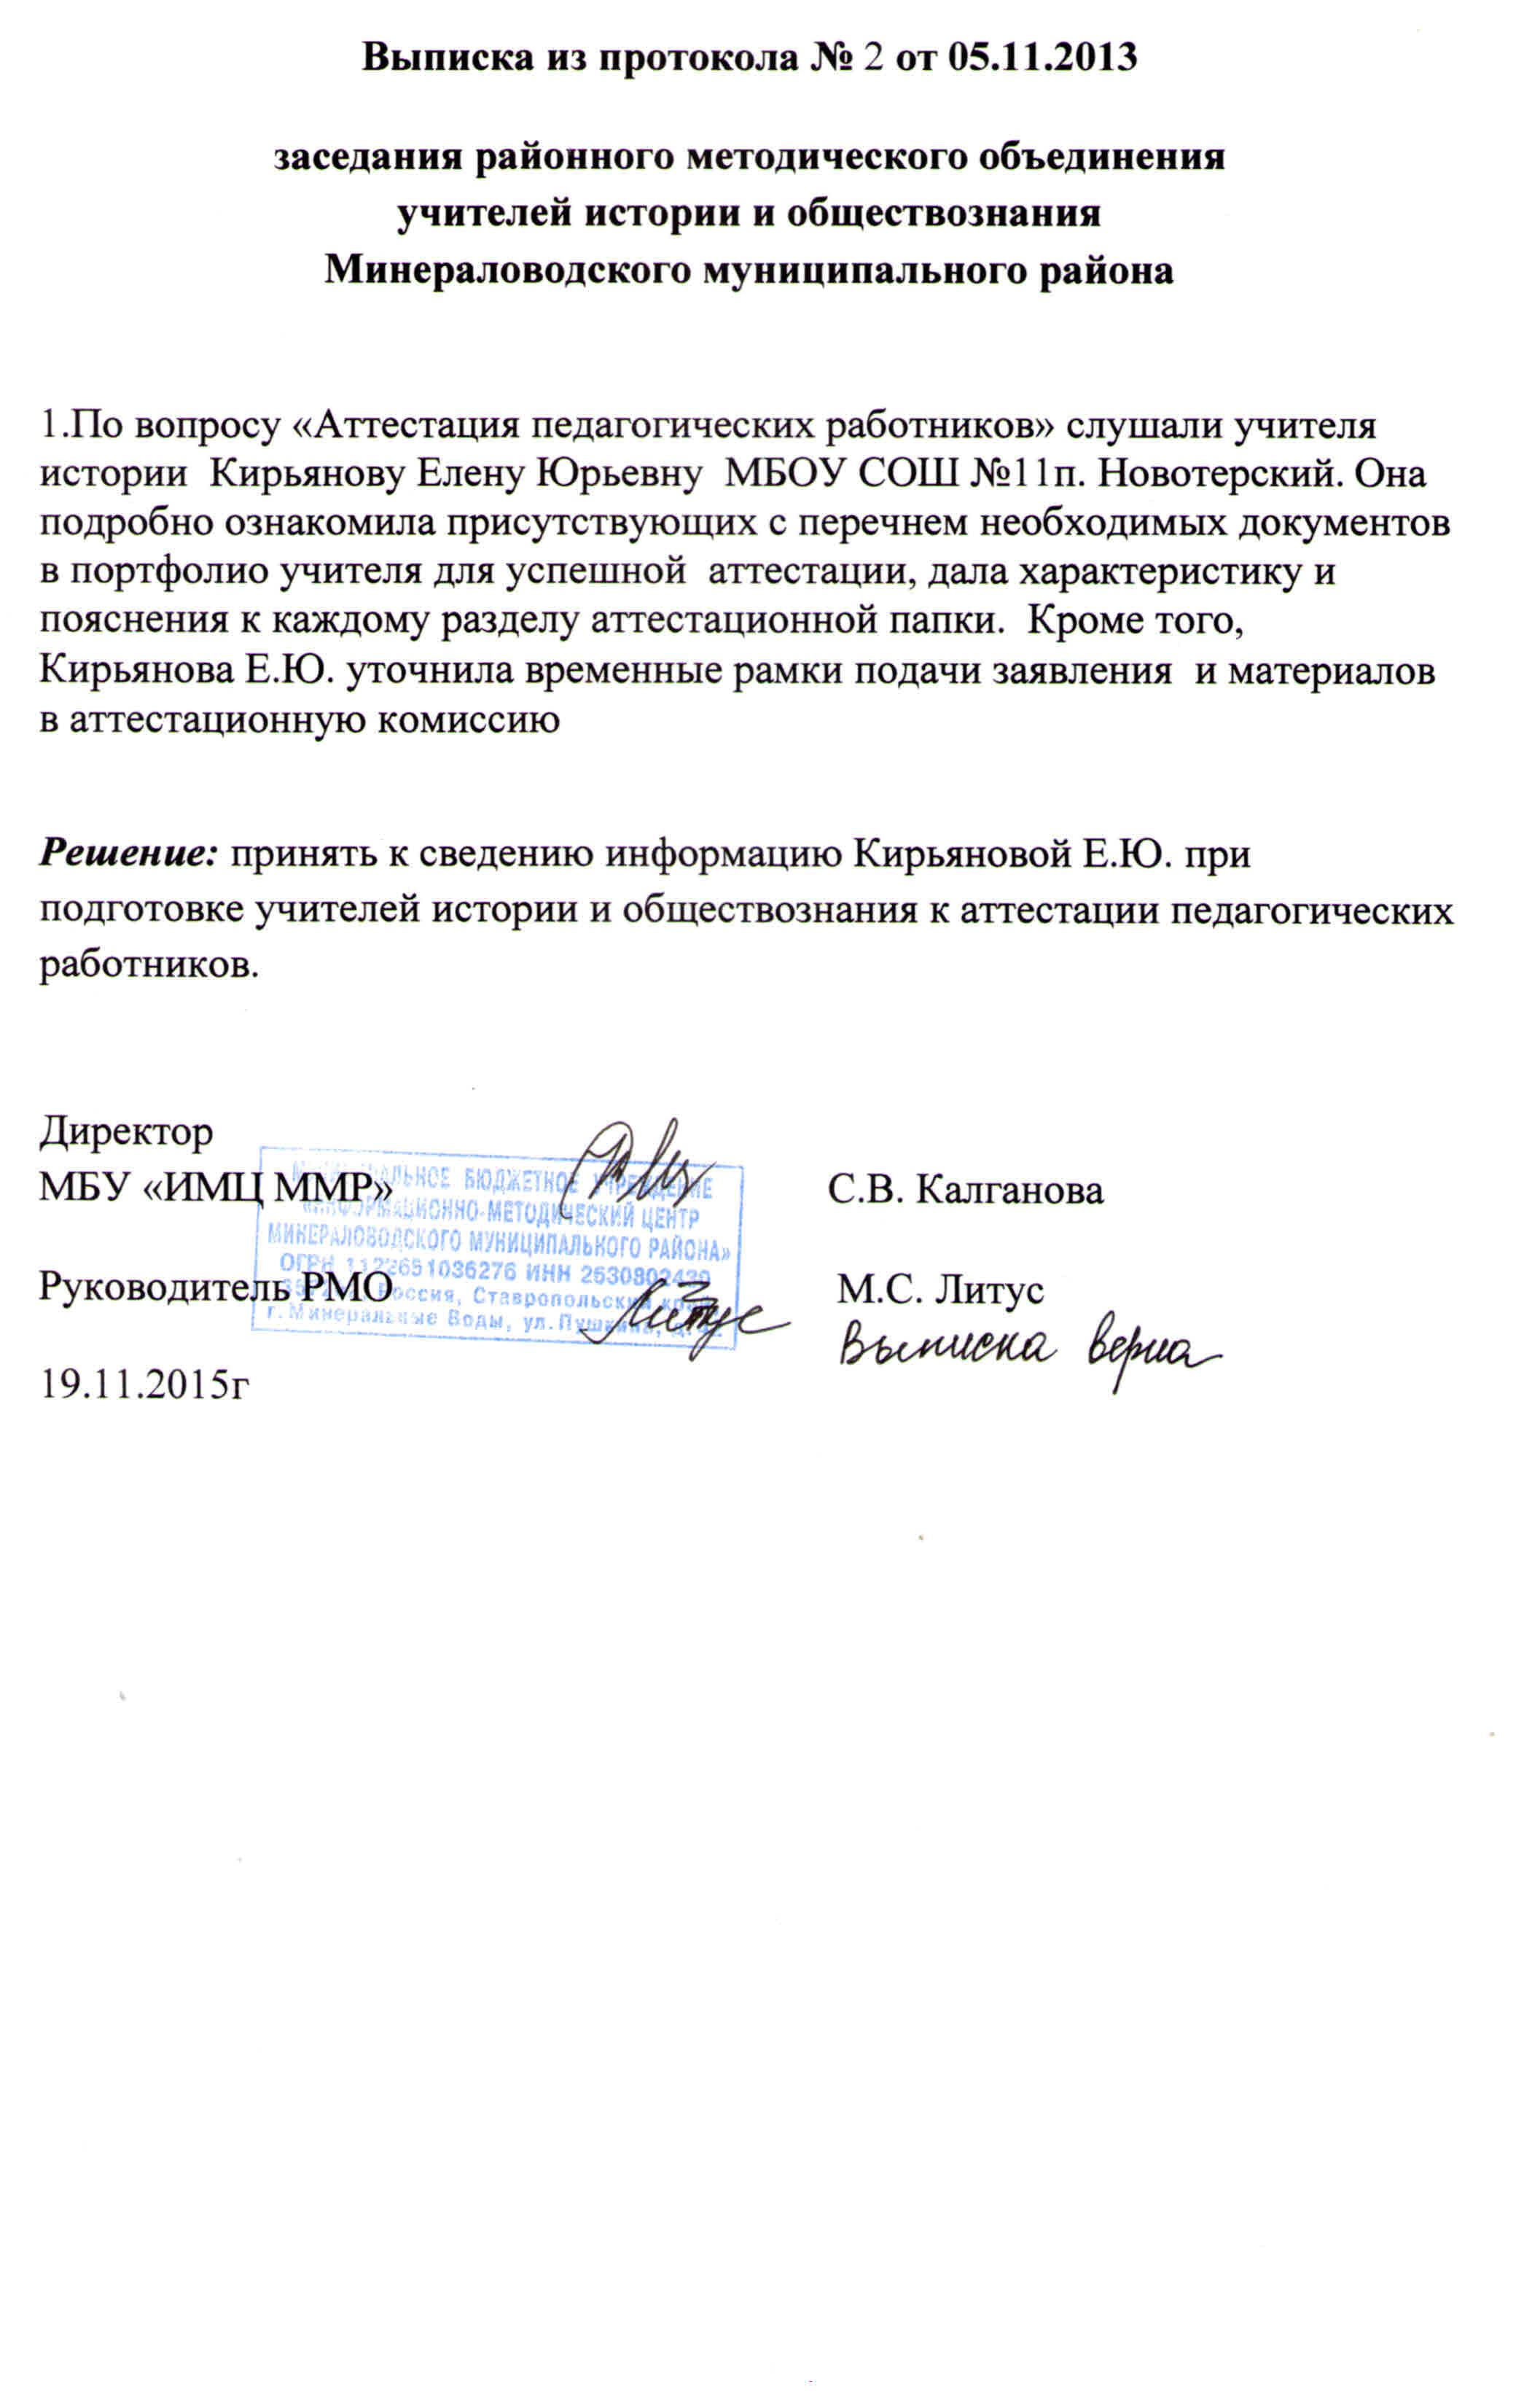 C:\Users\Сергей\Desktop\рмо\Document_5.jpg